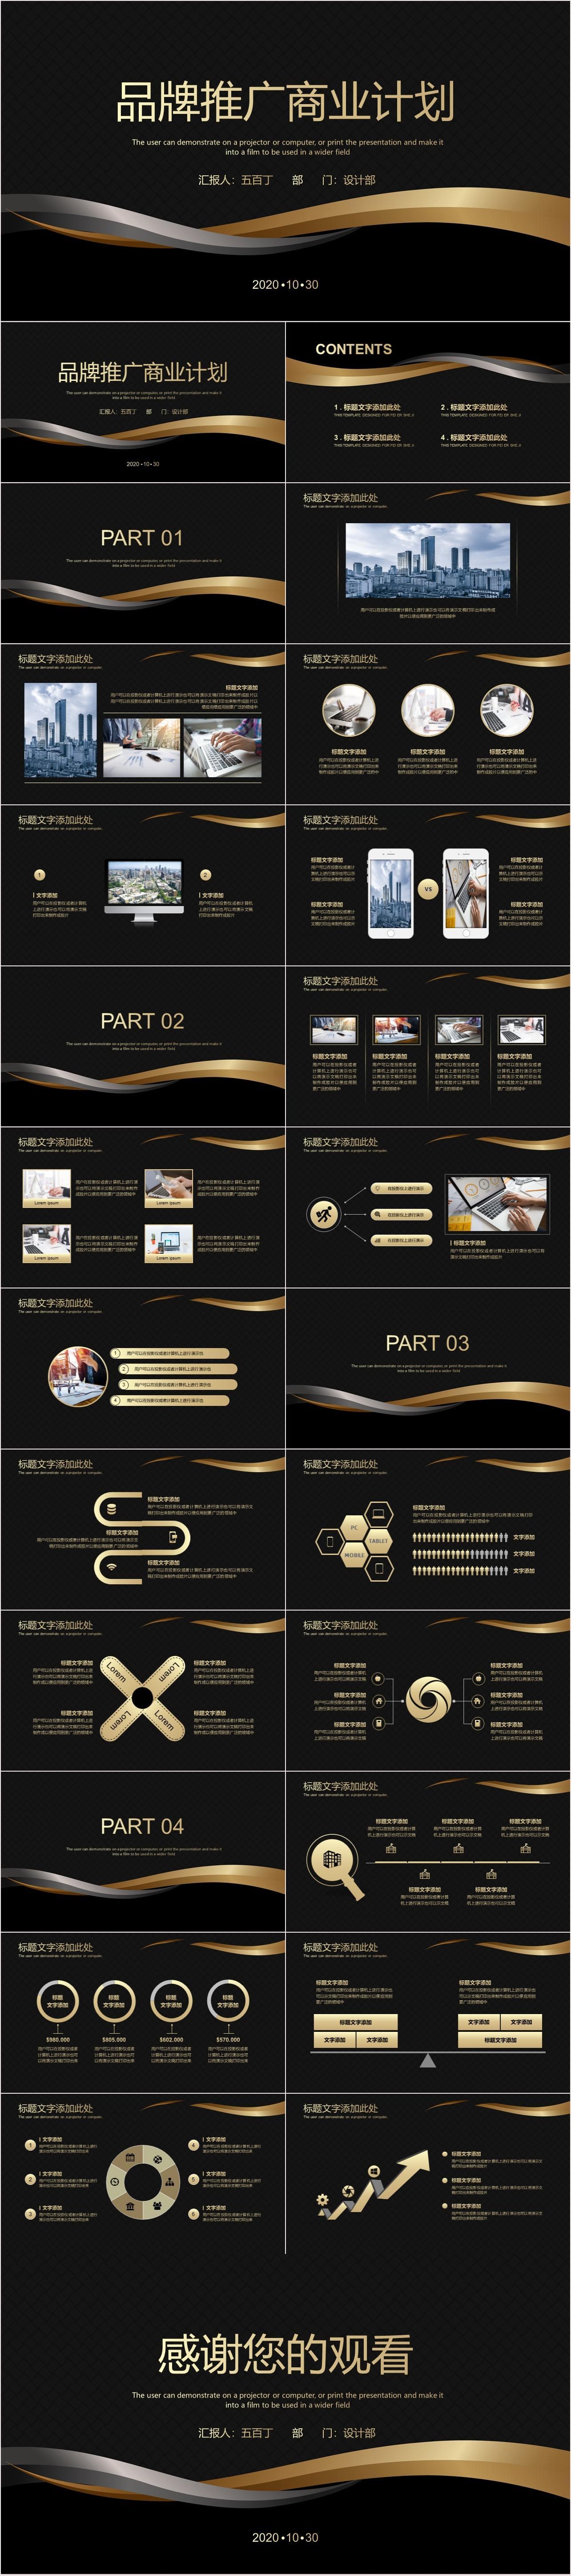 CL0111 黑金商务品牌推广方案计划书PPT模板